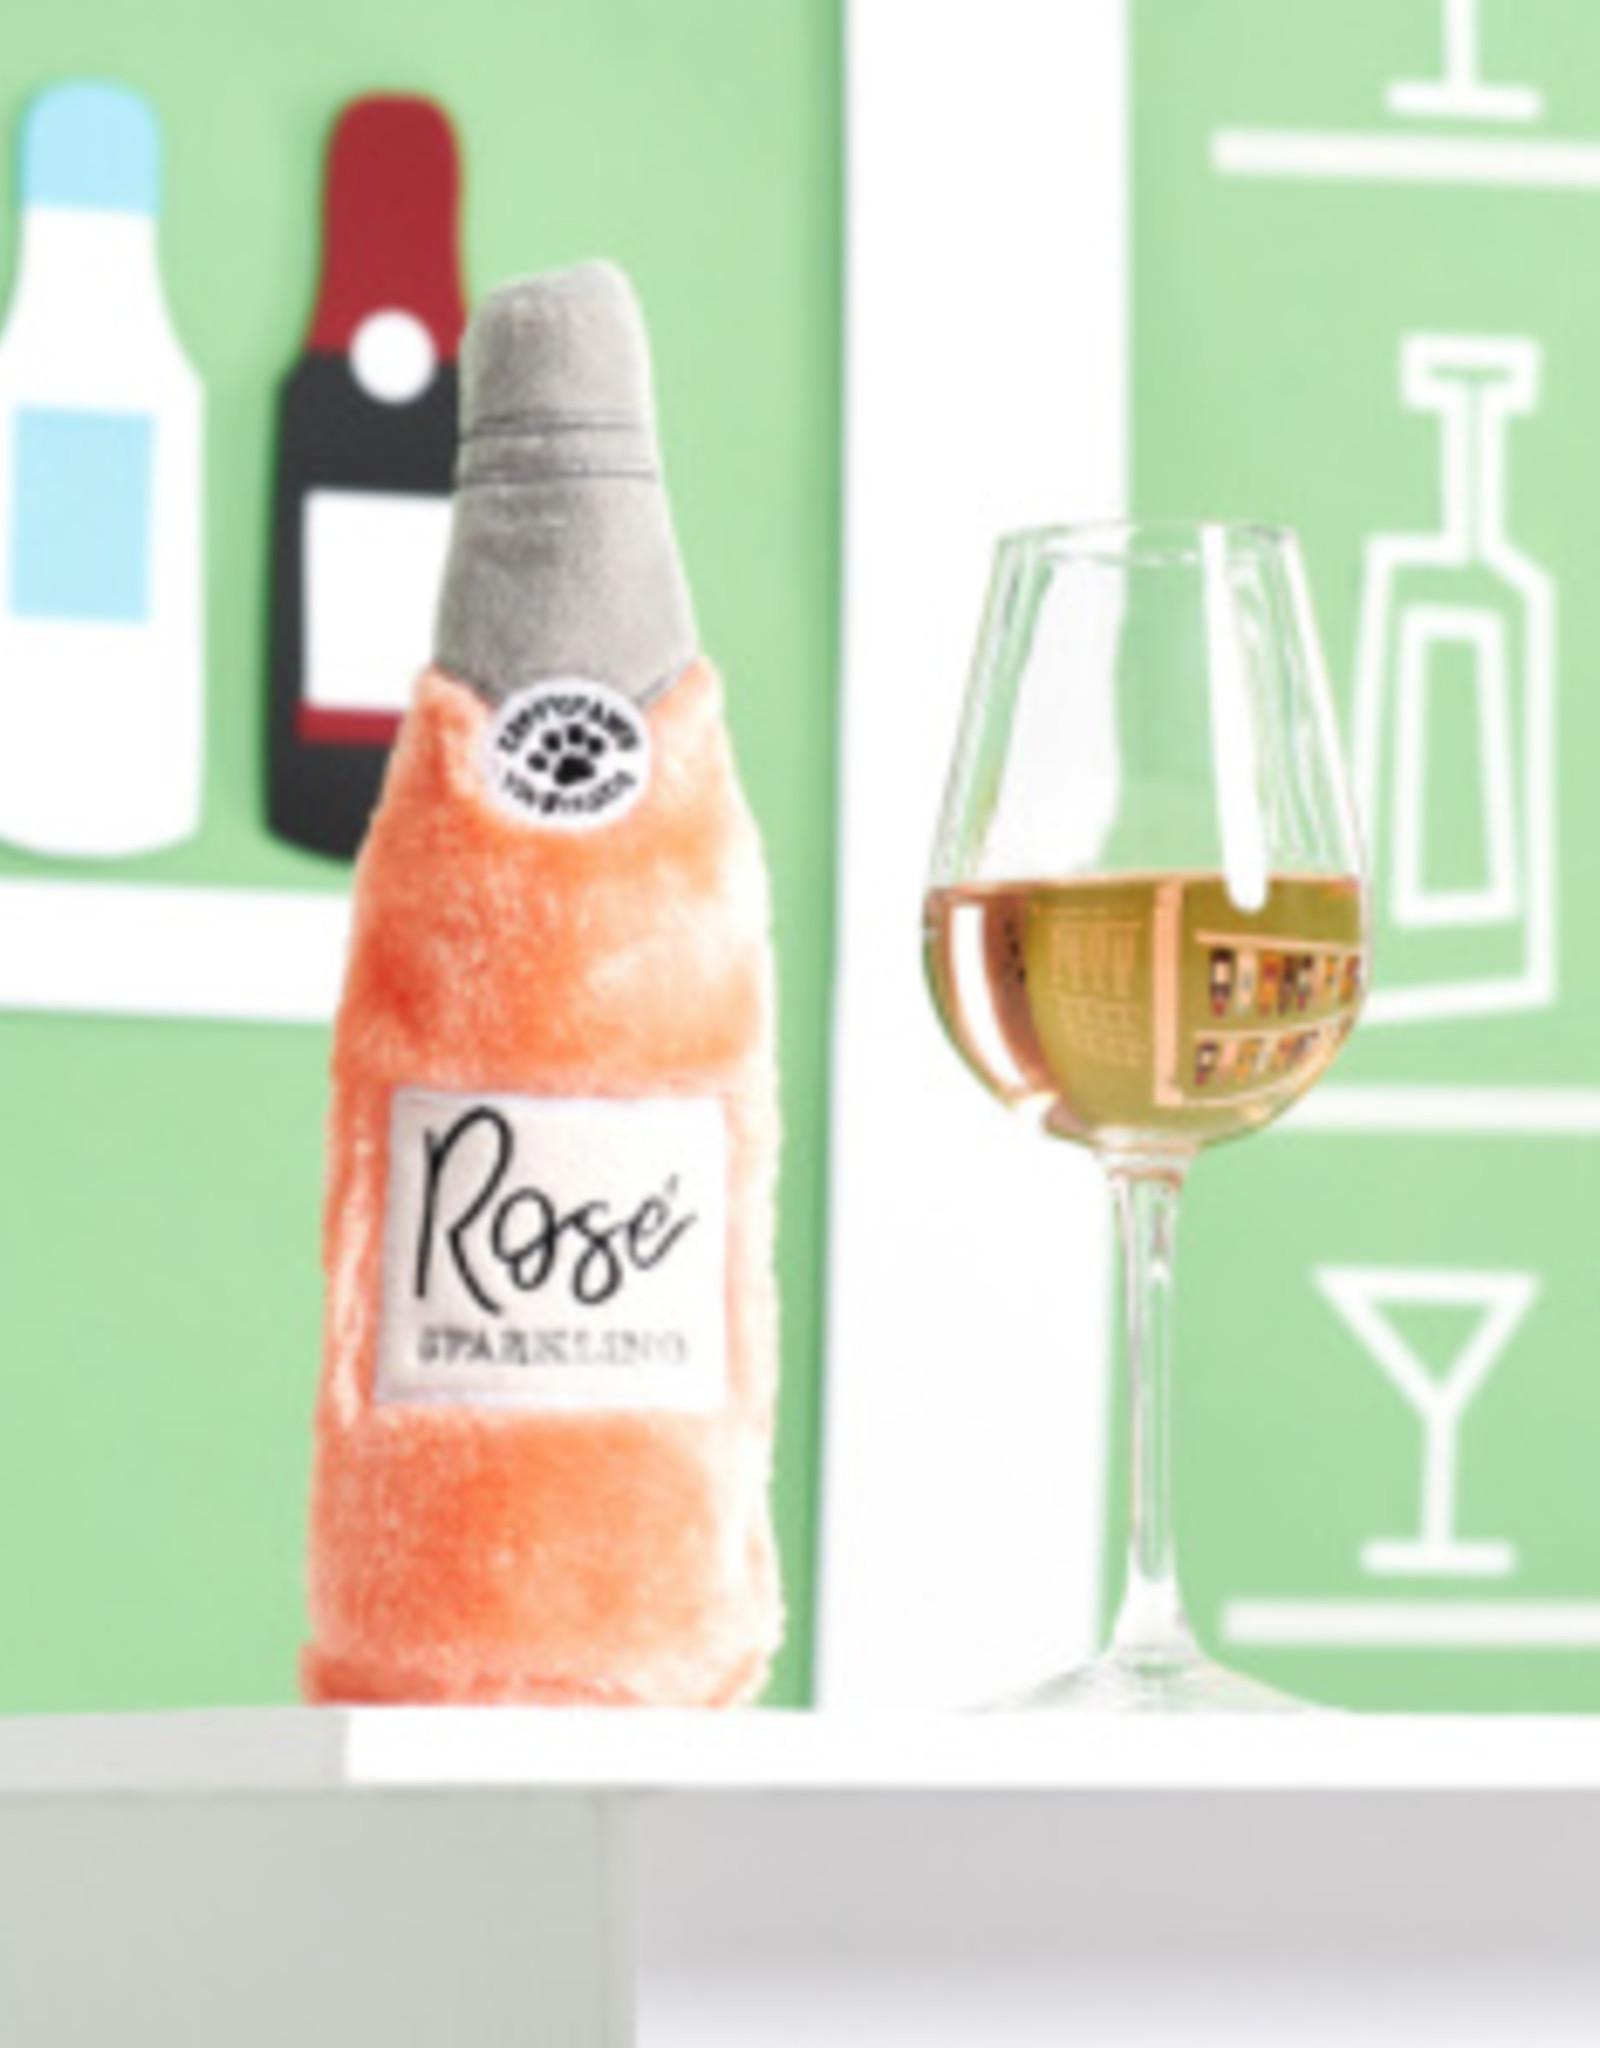 Rosé Crusherz